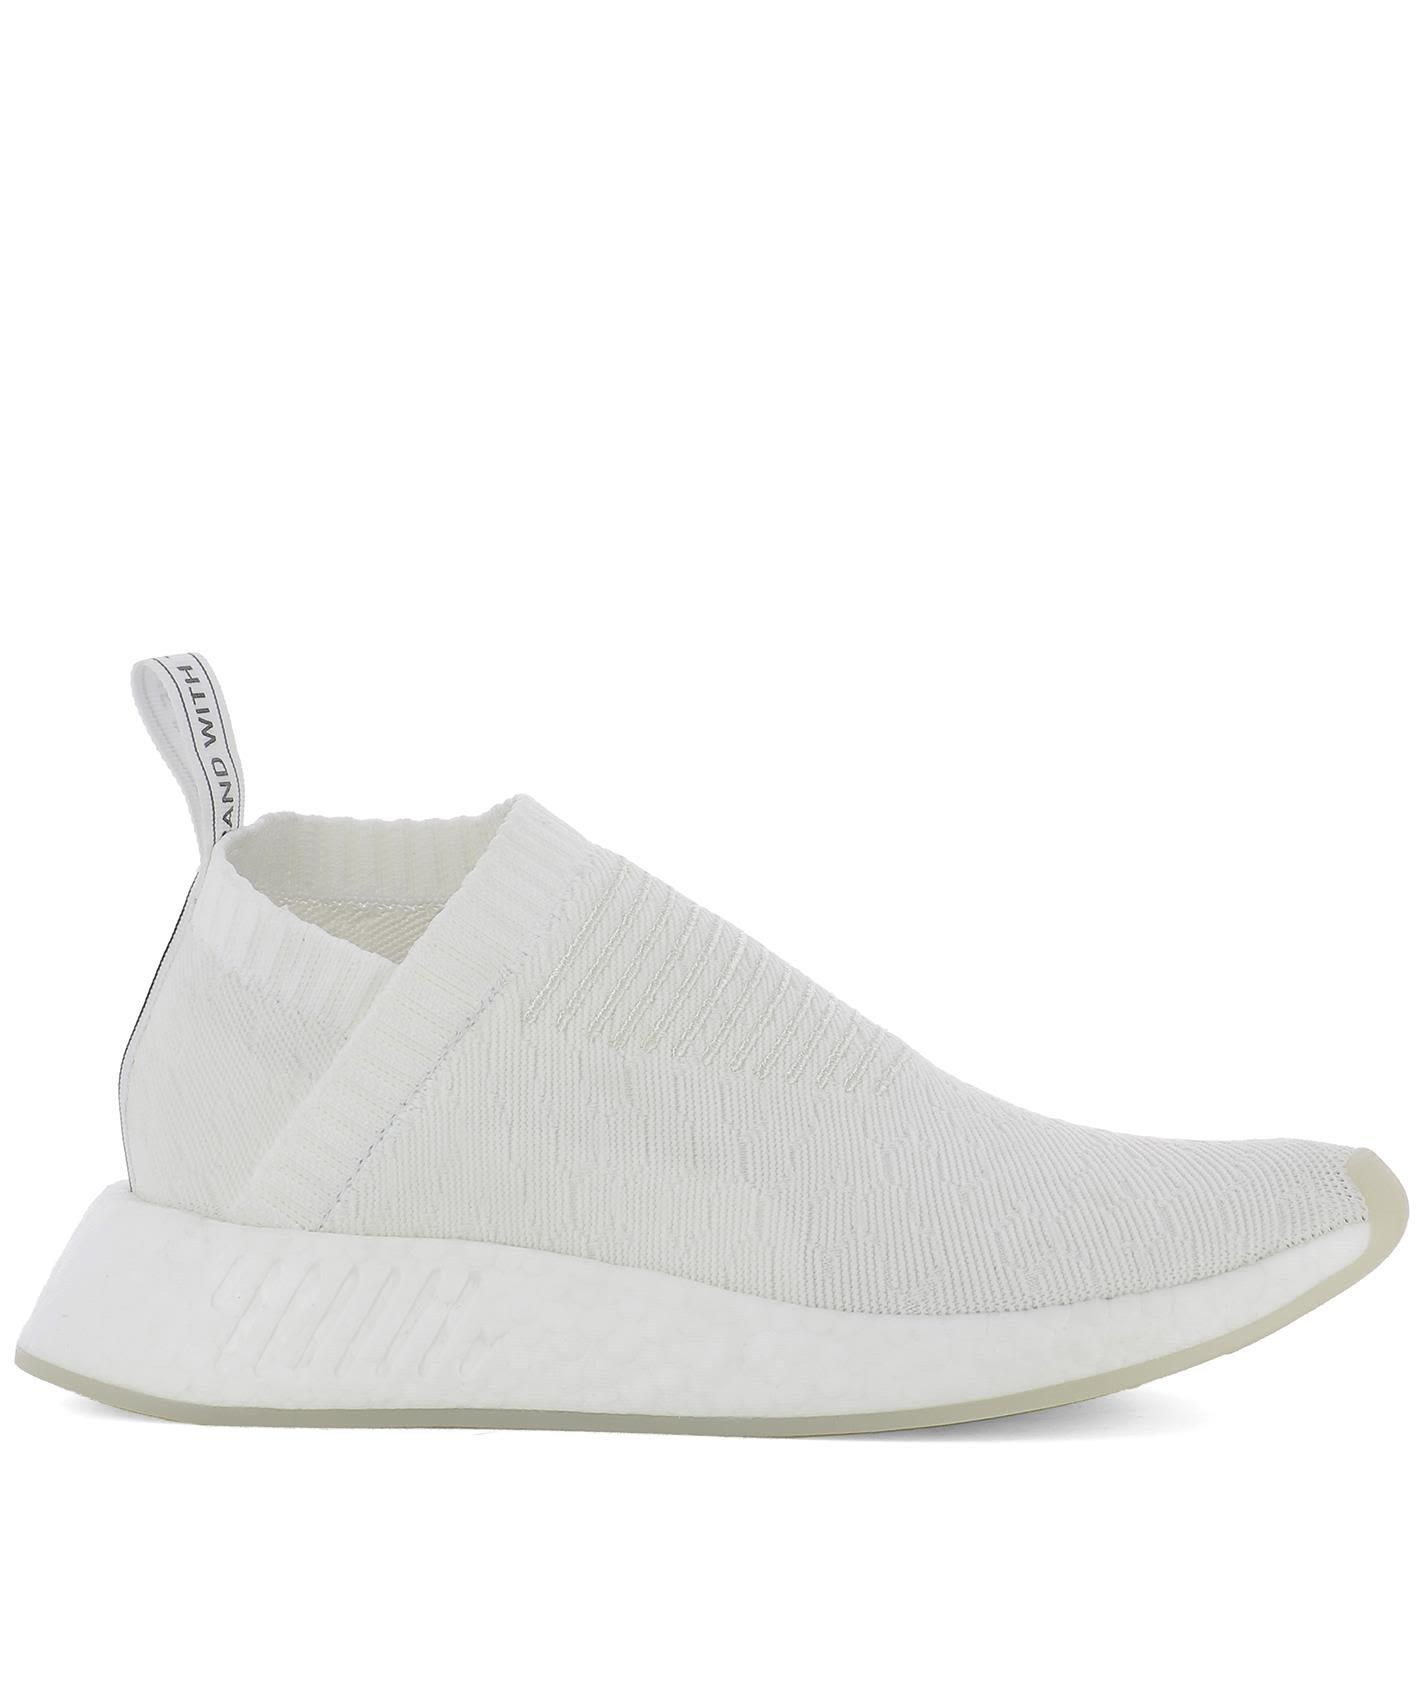 White Fabric Nmd Cs2 Pk W Sneakers